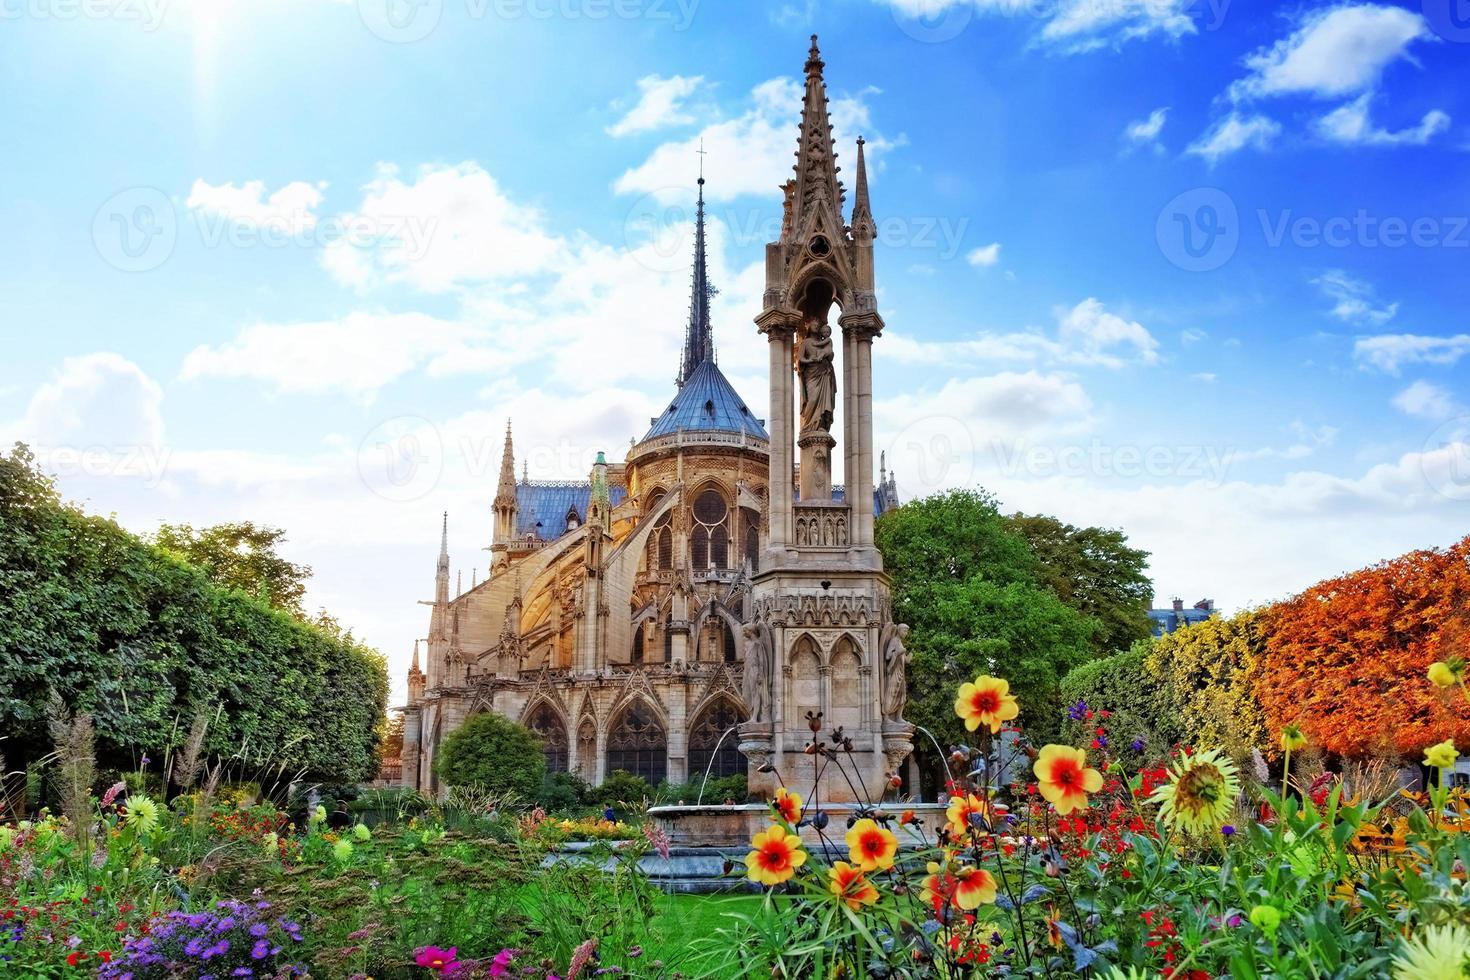 notre dame de paris kathedrale, garten mit blumen.paris. Frankreich foto